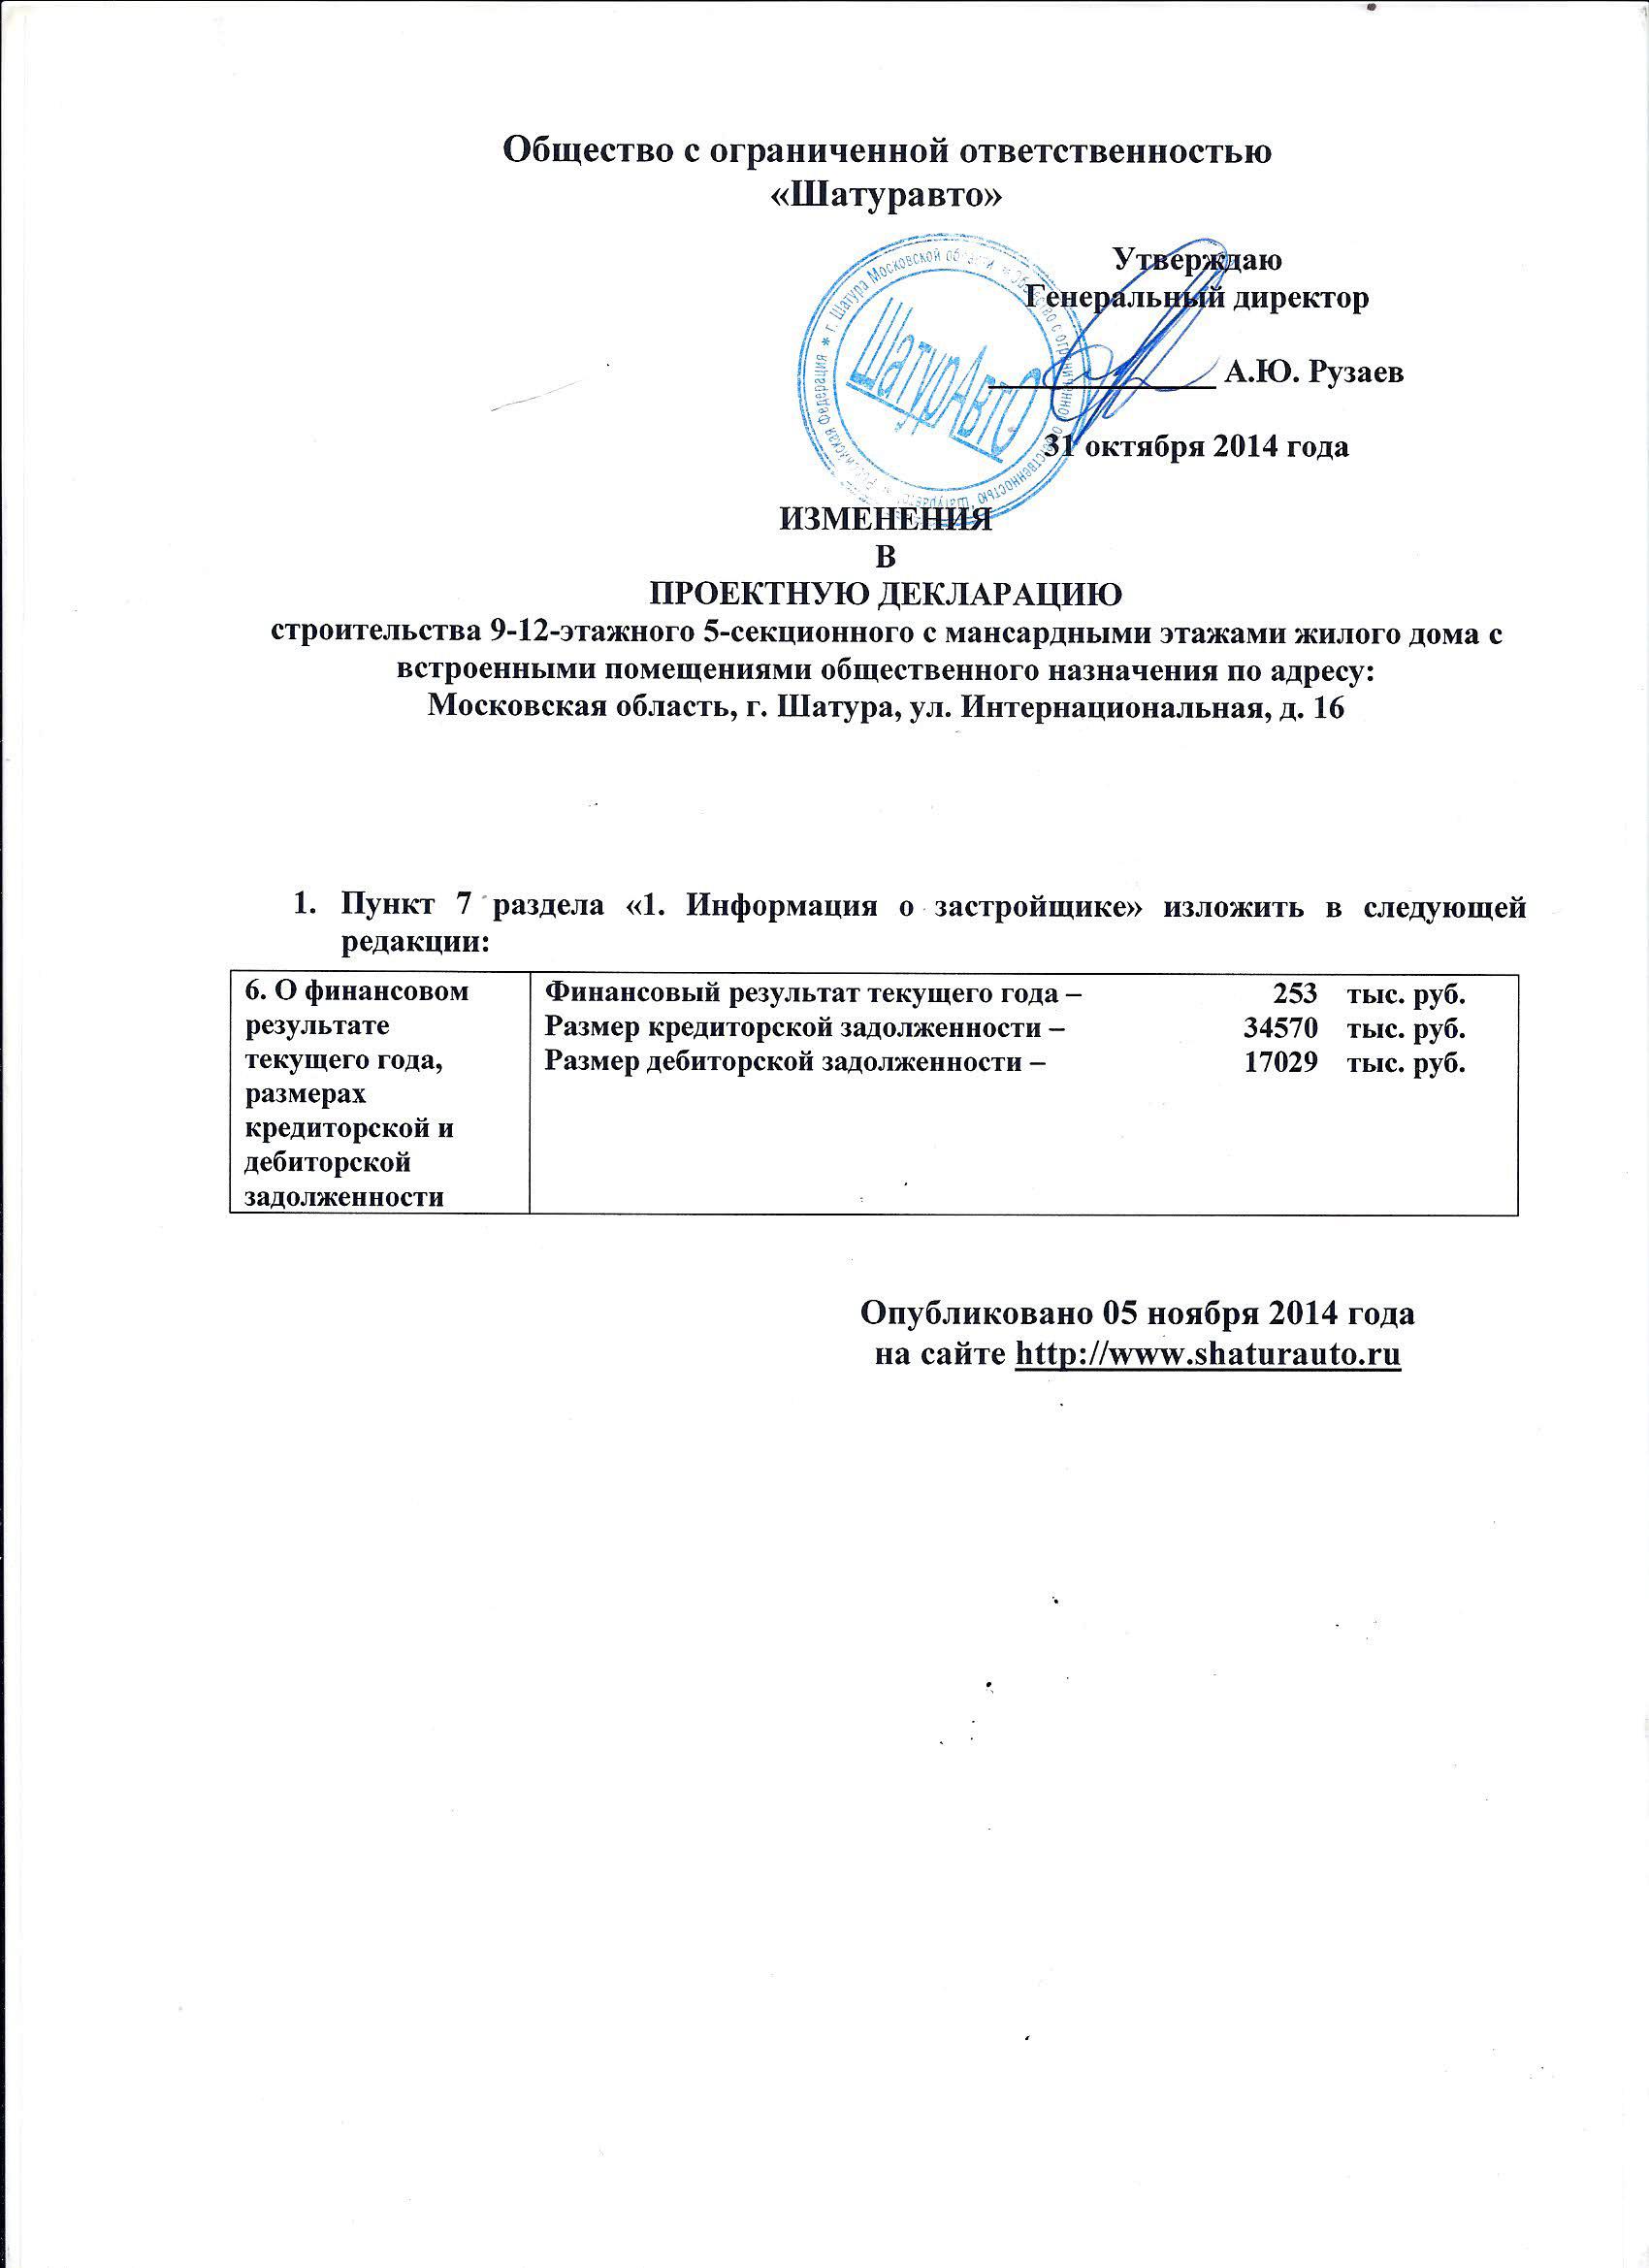 http://www.shaturauto.ru/images/DOCS/declaraciya/izmeneniya/inter31okt14.jpg